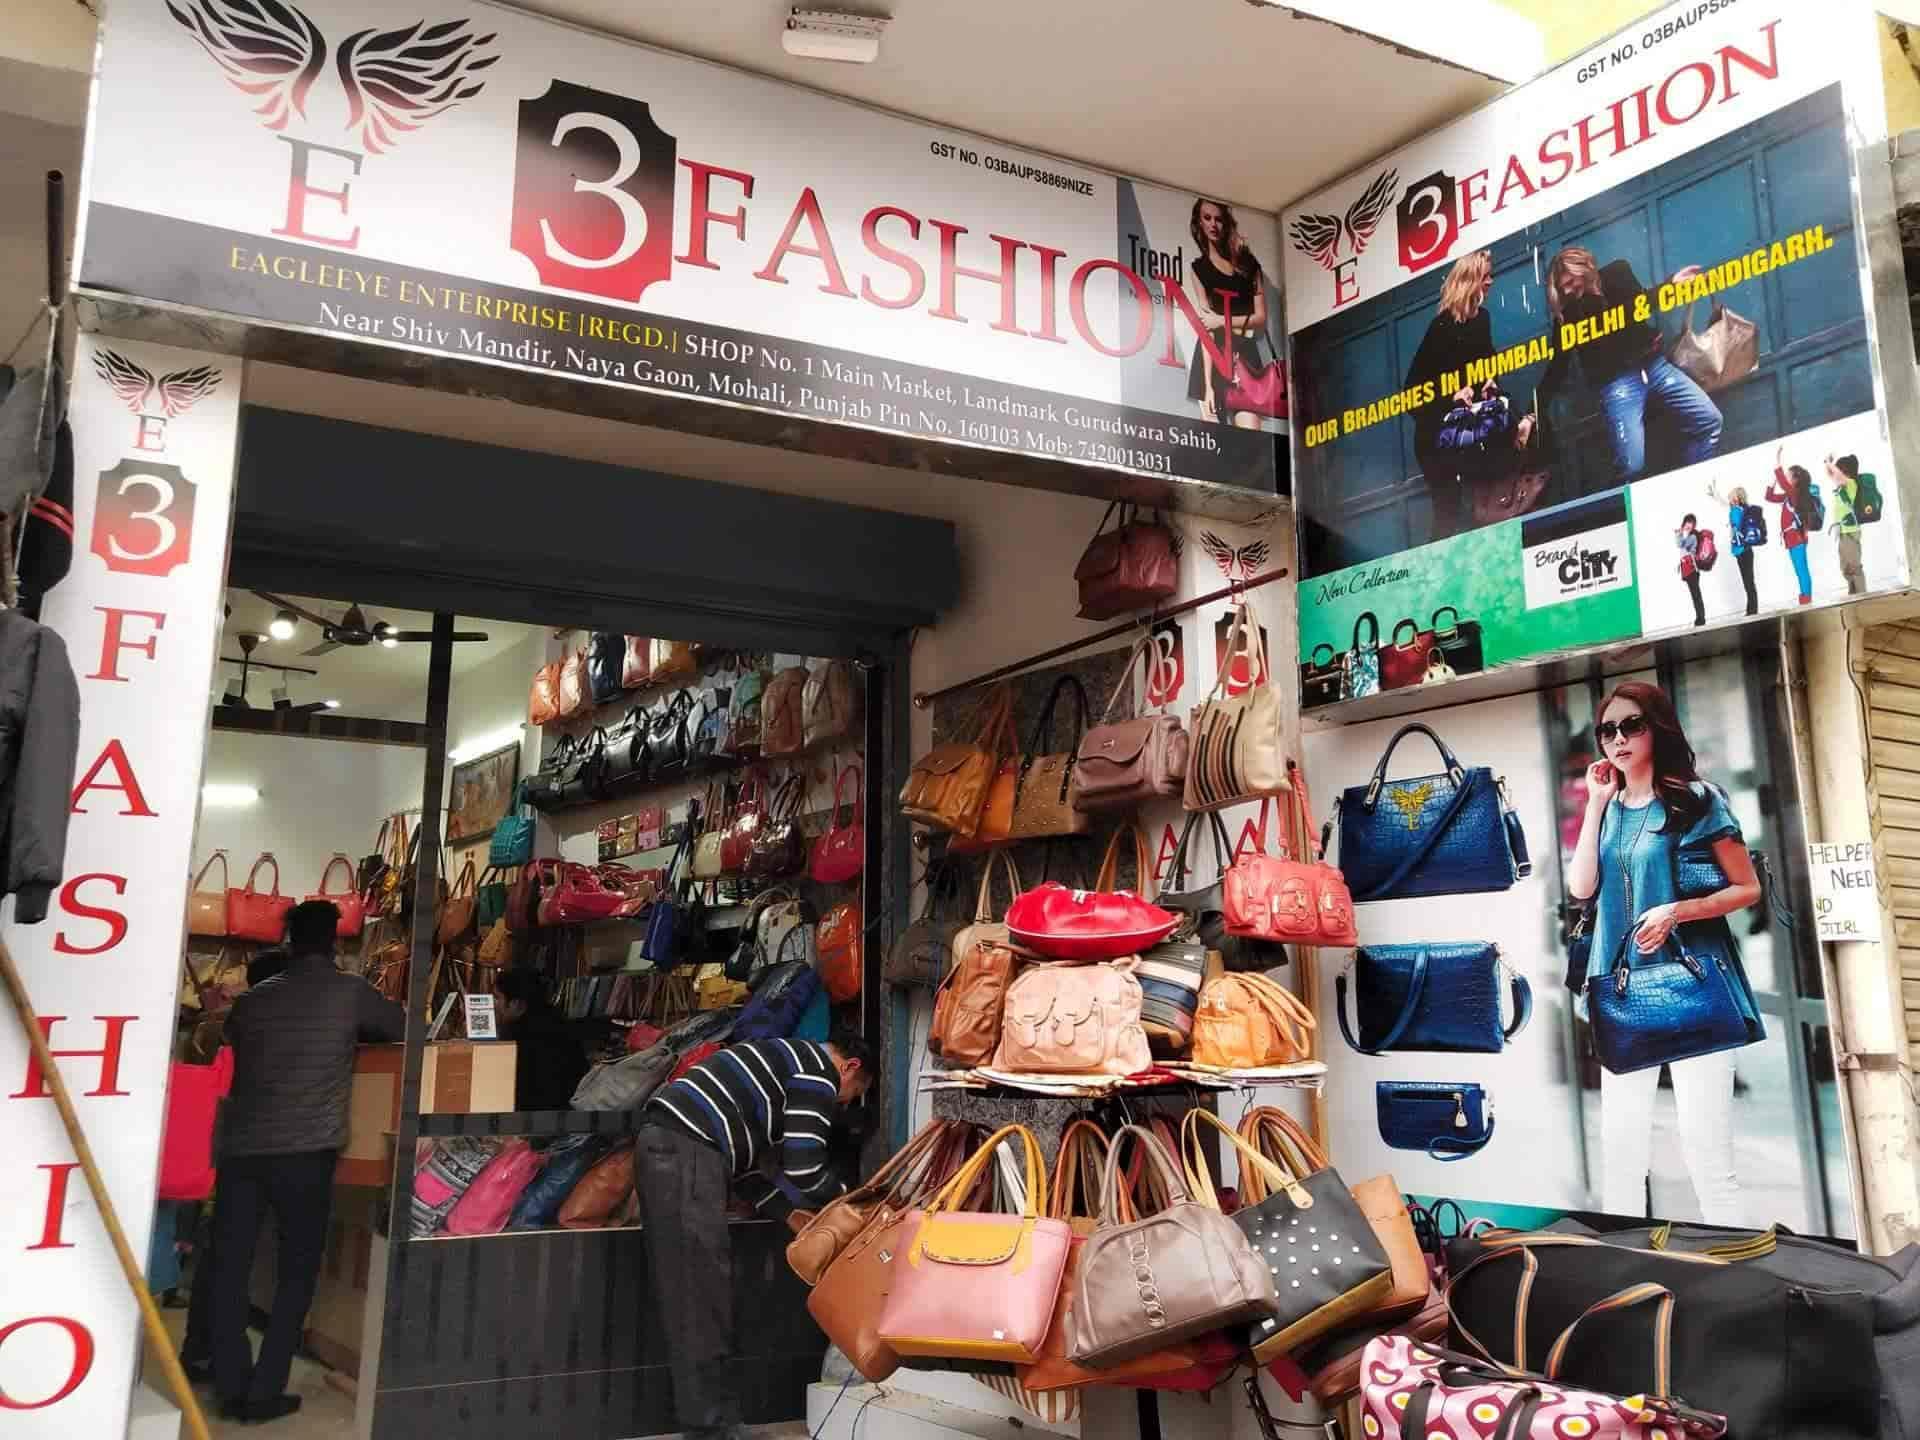 E 3 Fashion, Naya Gaon - Bag Dealers in Chandigarh - Justdial